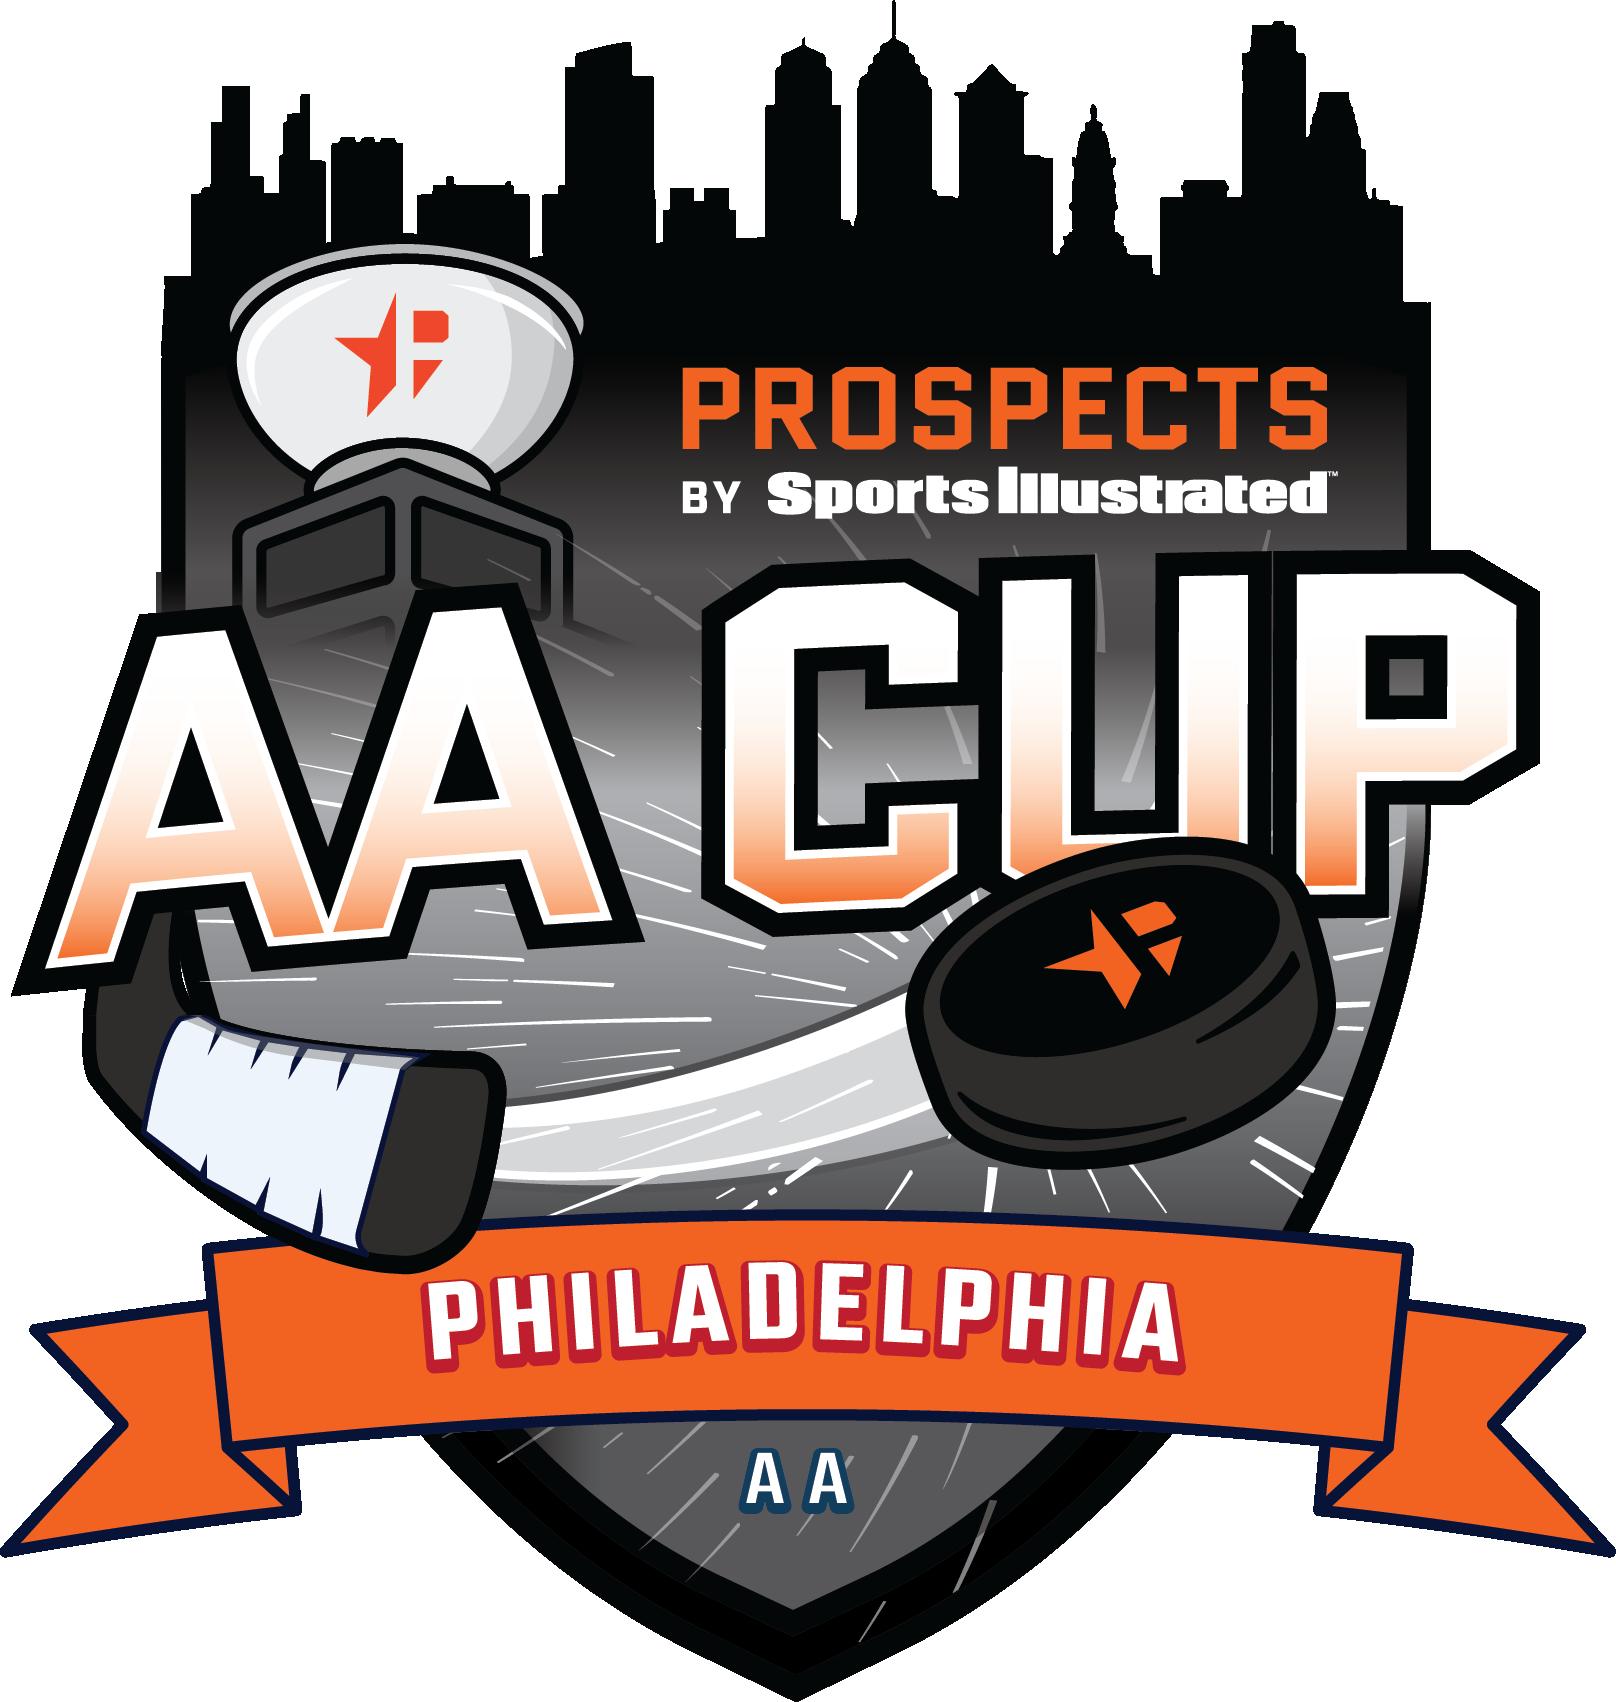 AA Cup Philadelphia -Prospects Cup Series logo